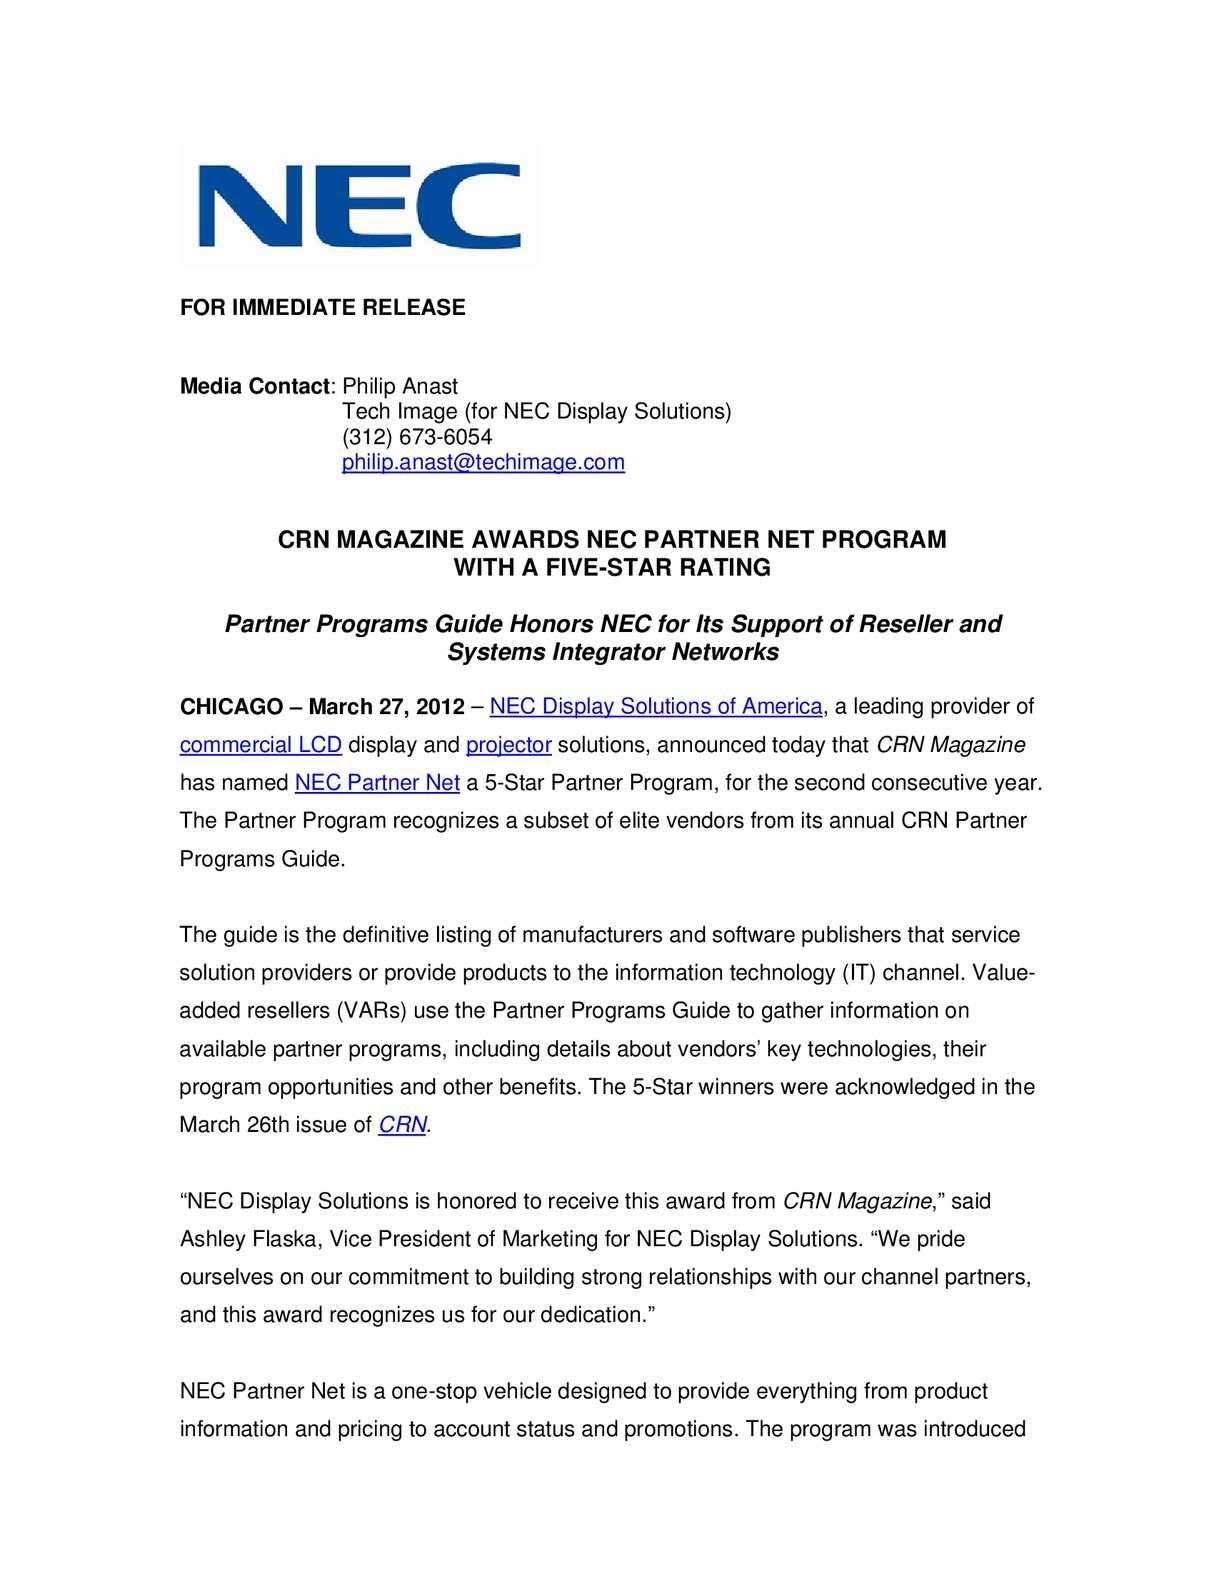 Calaméo - CRN MAGAZINE AWARDS NEC PARTNER NET PROGRAM